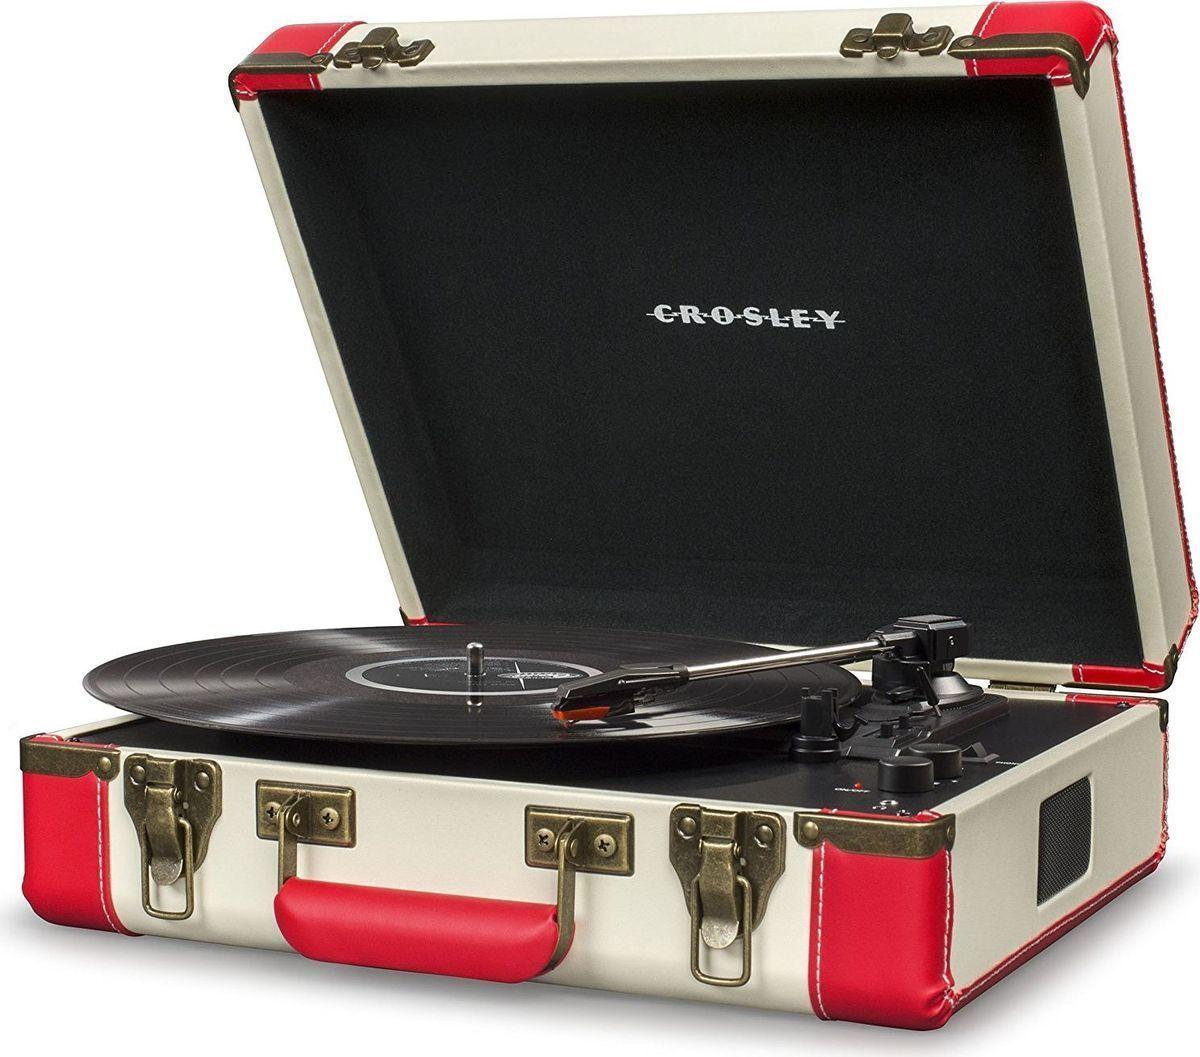 Crosley Executive Deluxe, Red Black виниловый проигрыватель